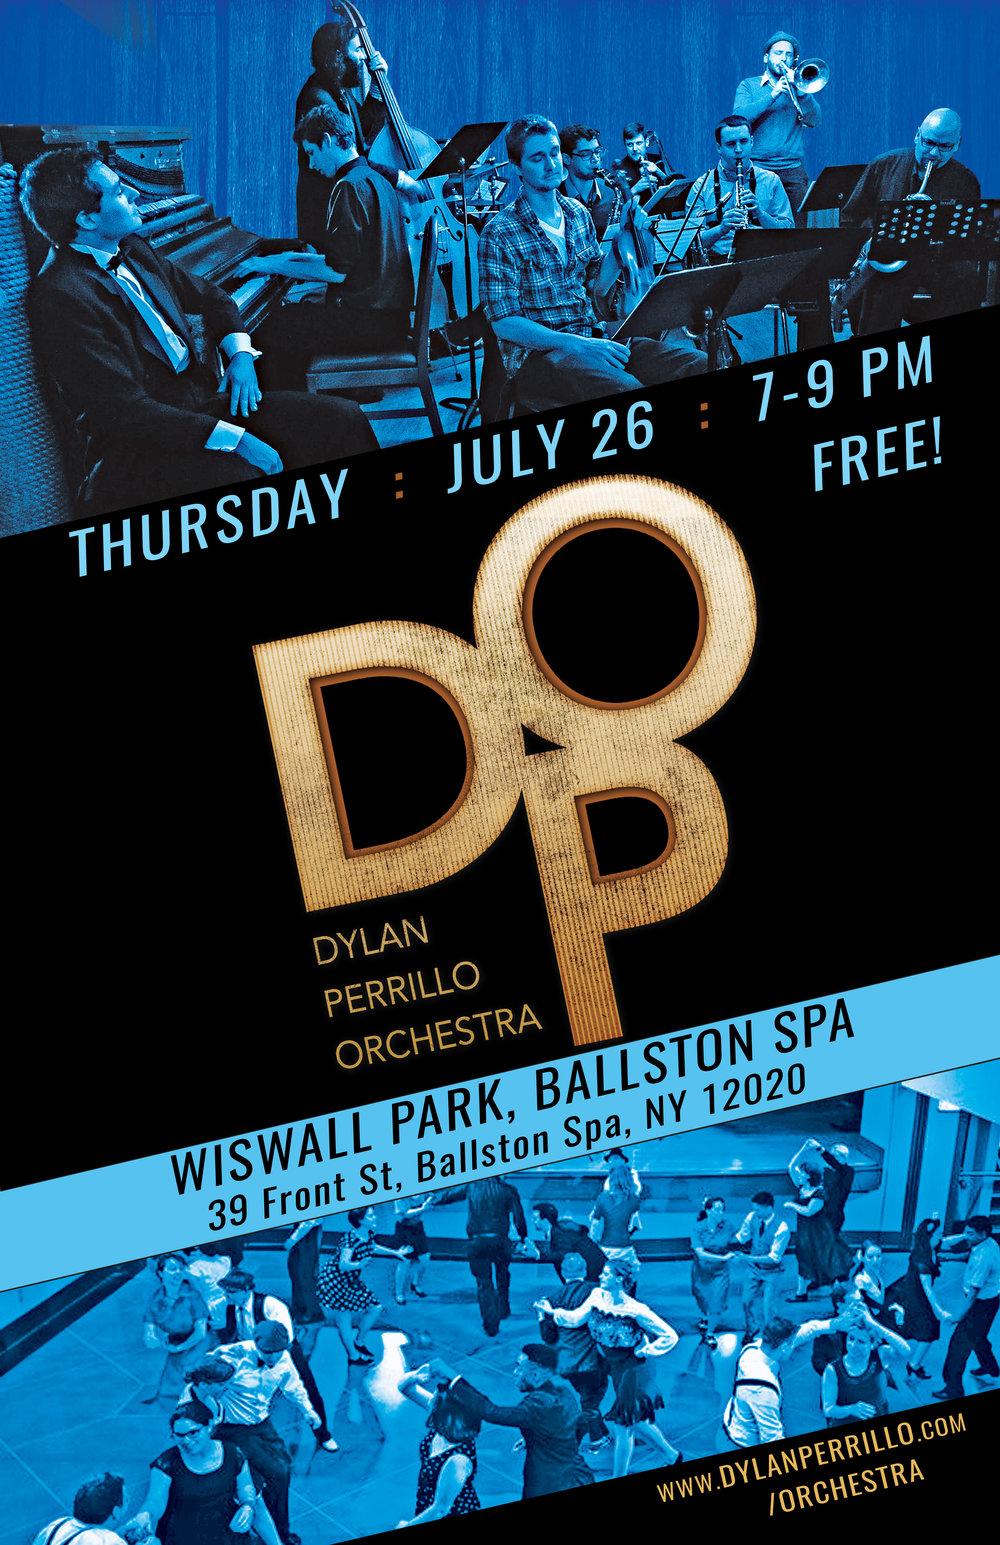 Dylan Perrillo Orchestra Ballston Spa.jpg